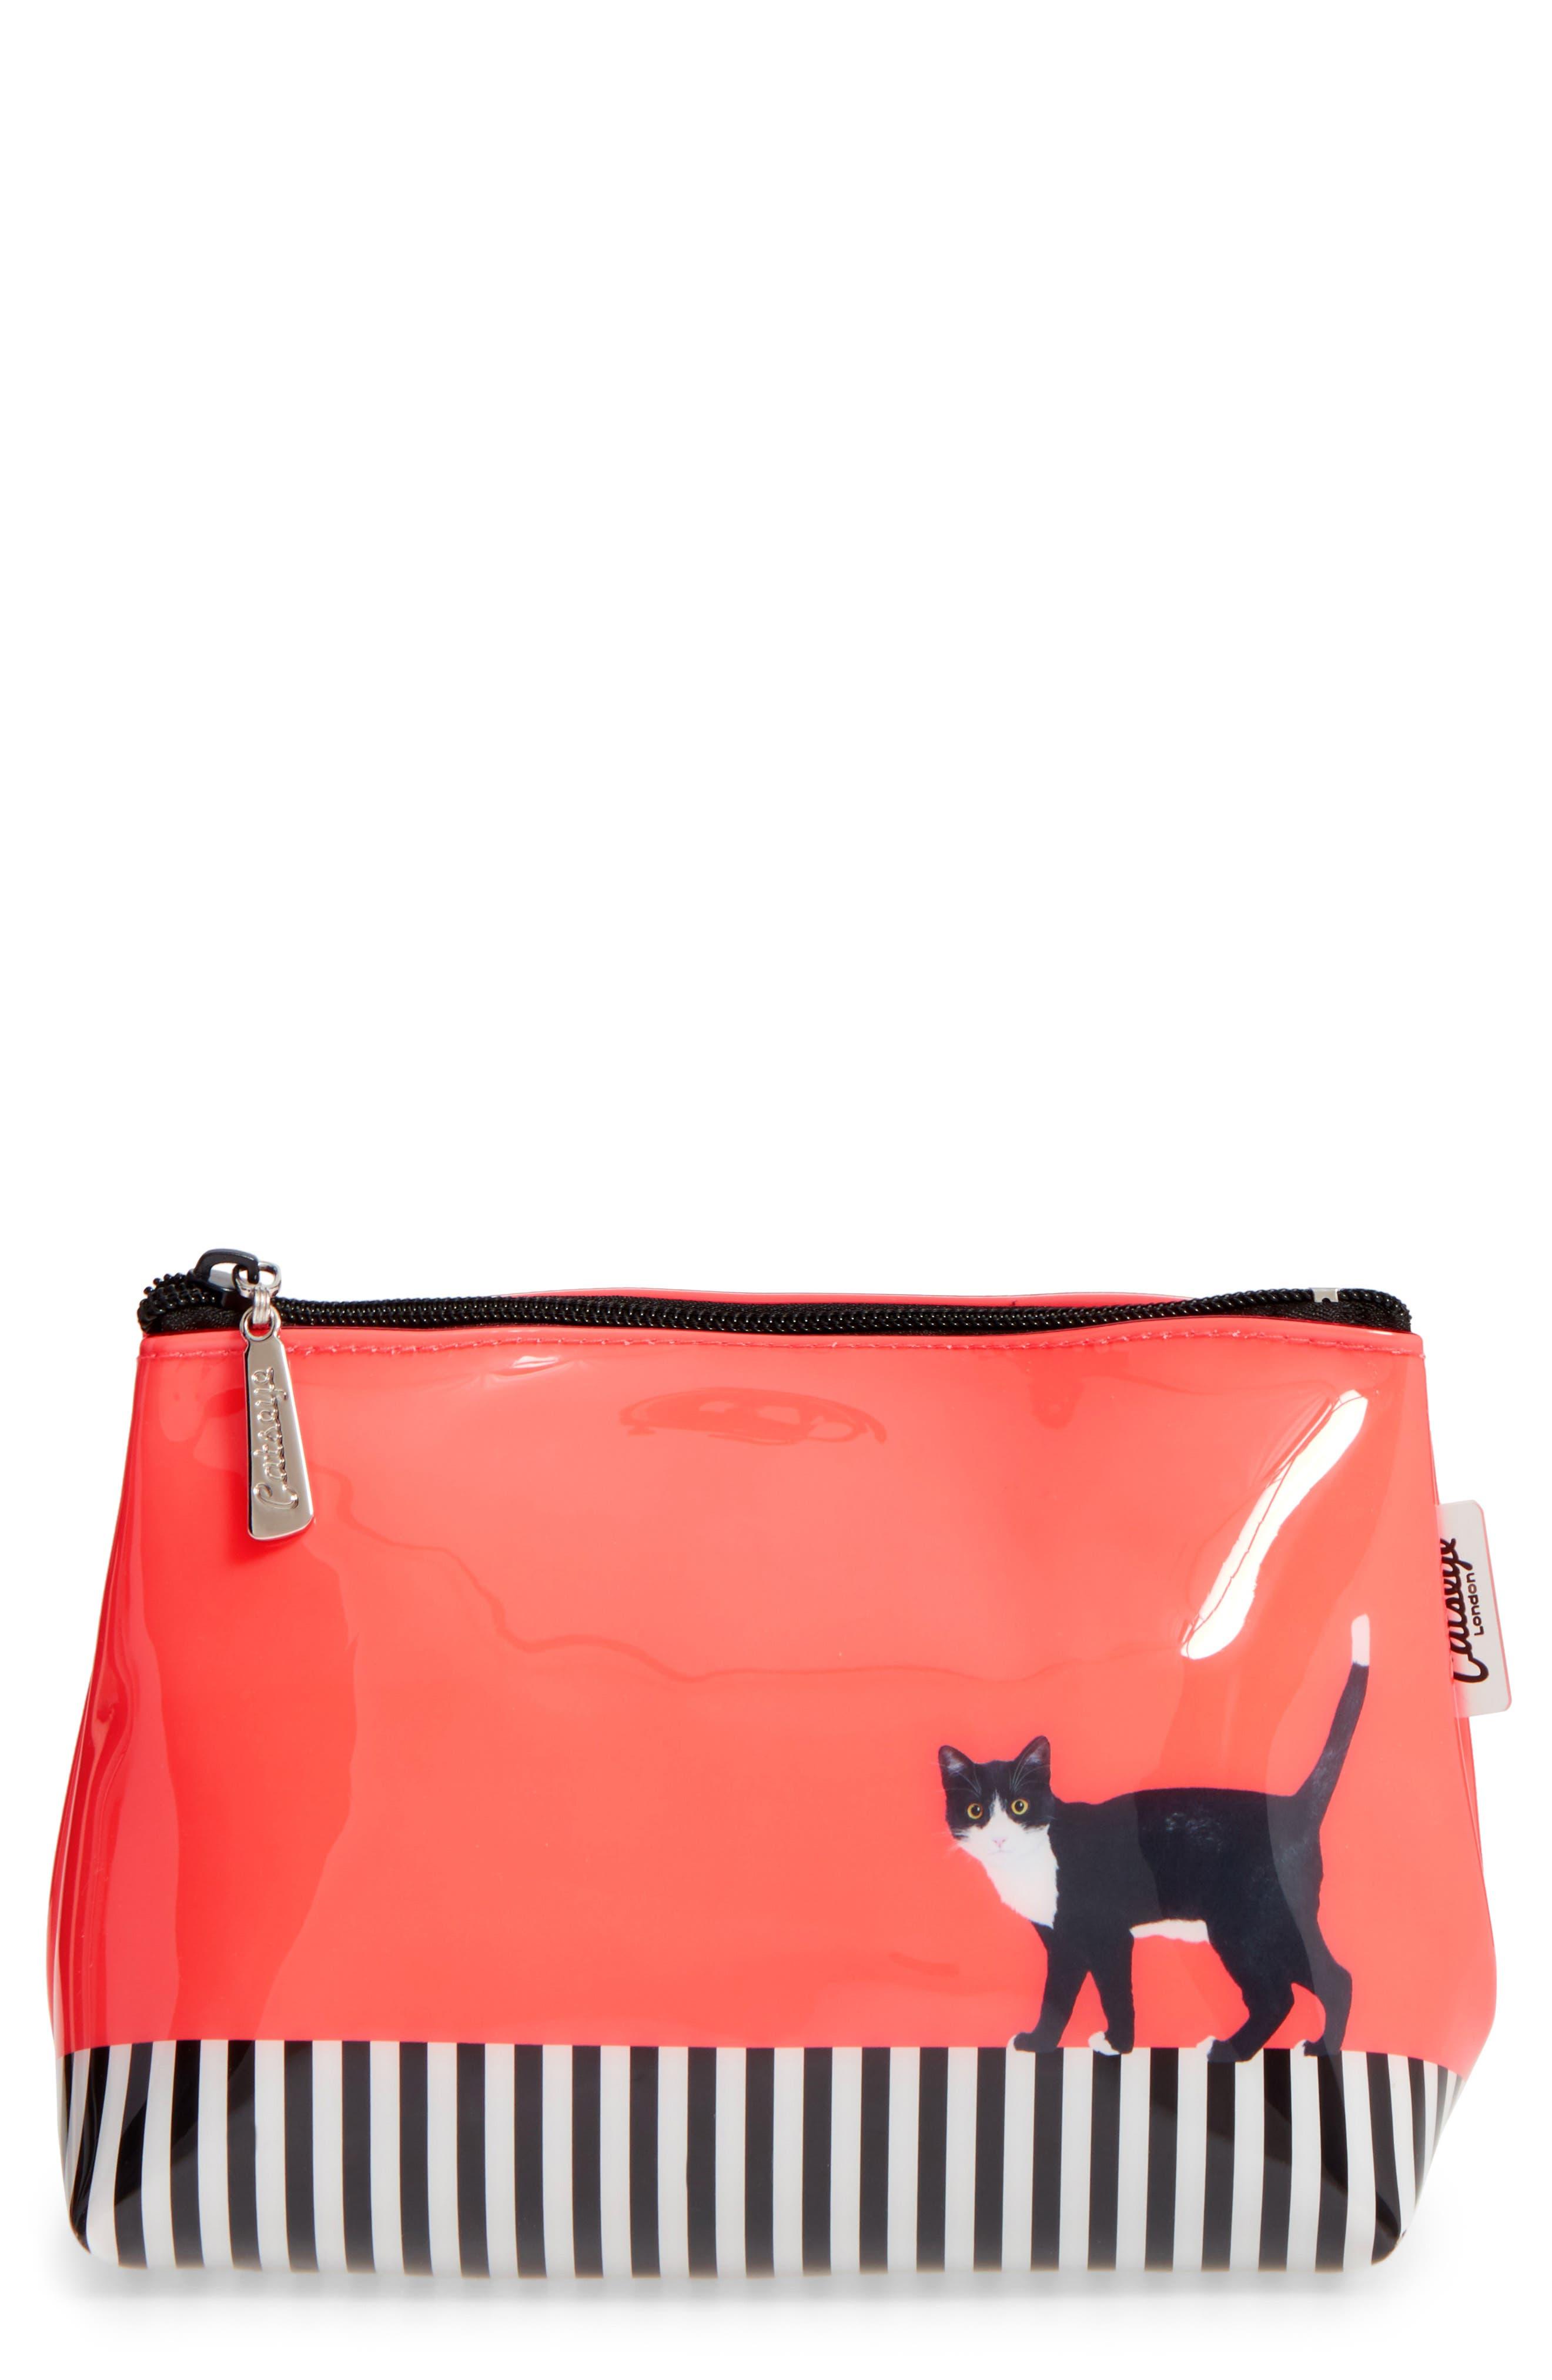 Catseye London Cat On Stripe Cosmetics Case